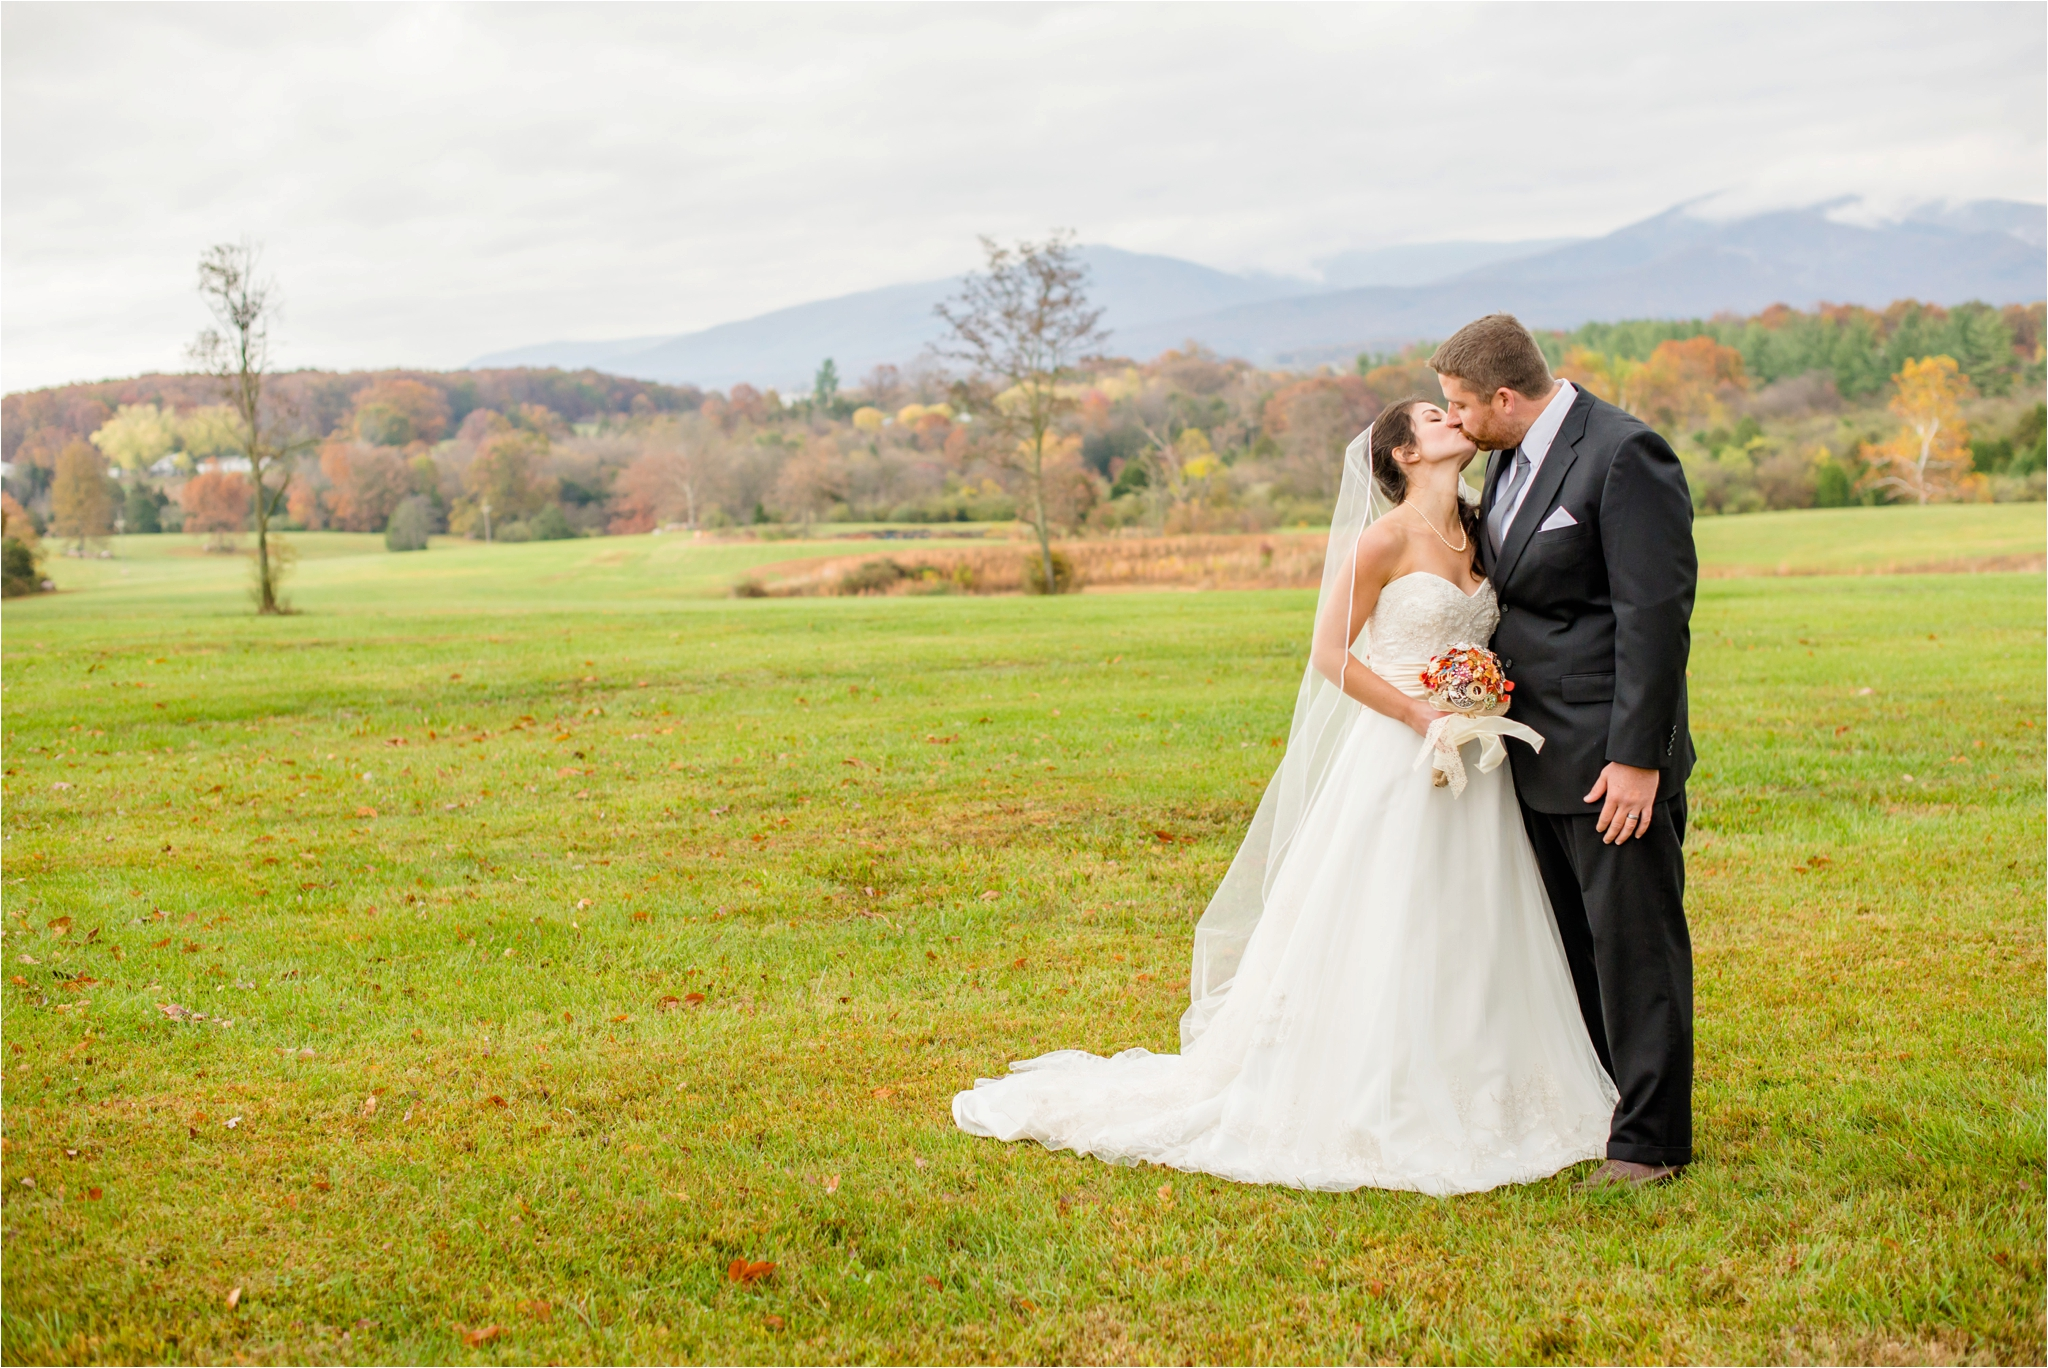 the-nifty-fifty-lens-jaclyn-auletta-photography-blog-north-carolina-wedding-photographer_0001.jpg